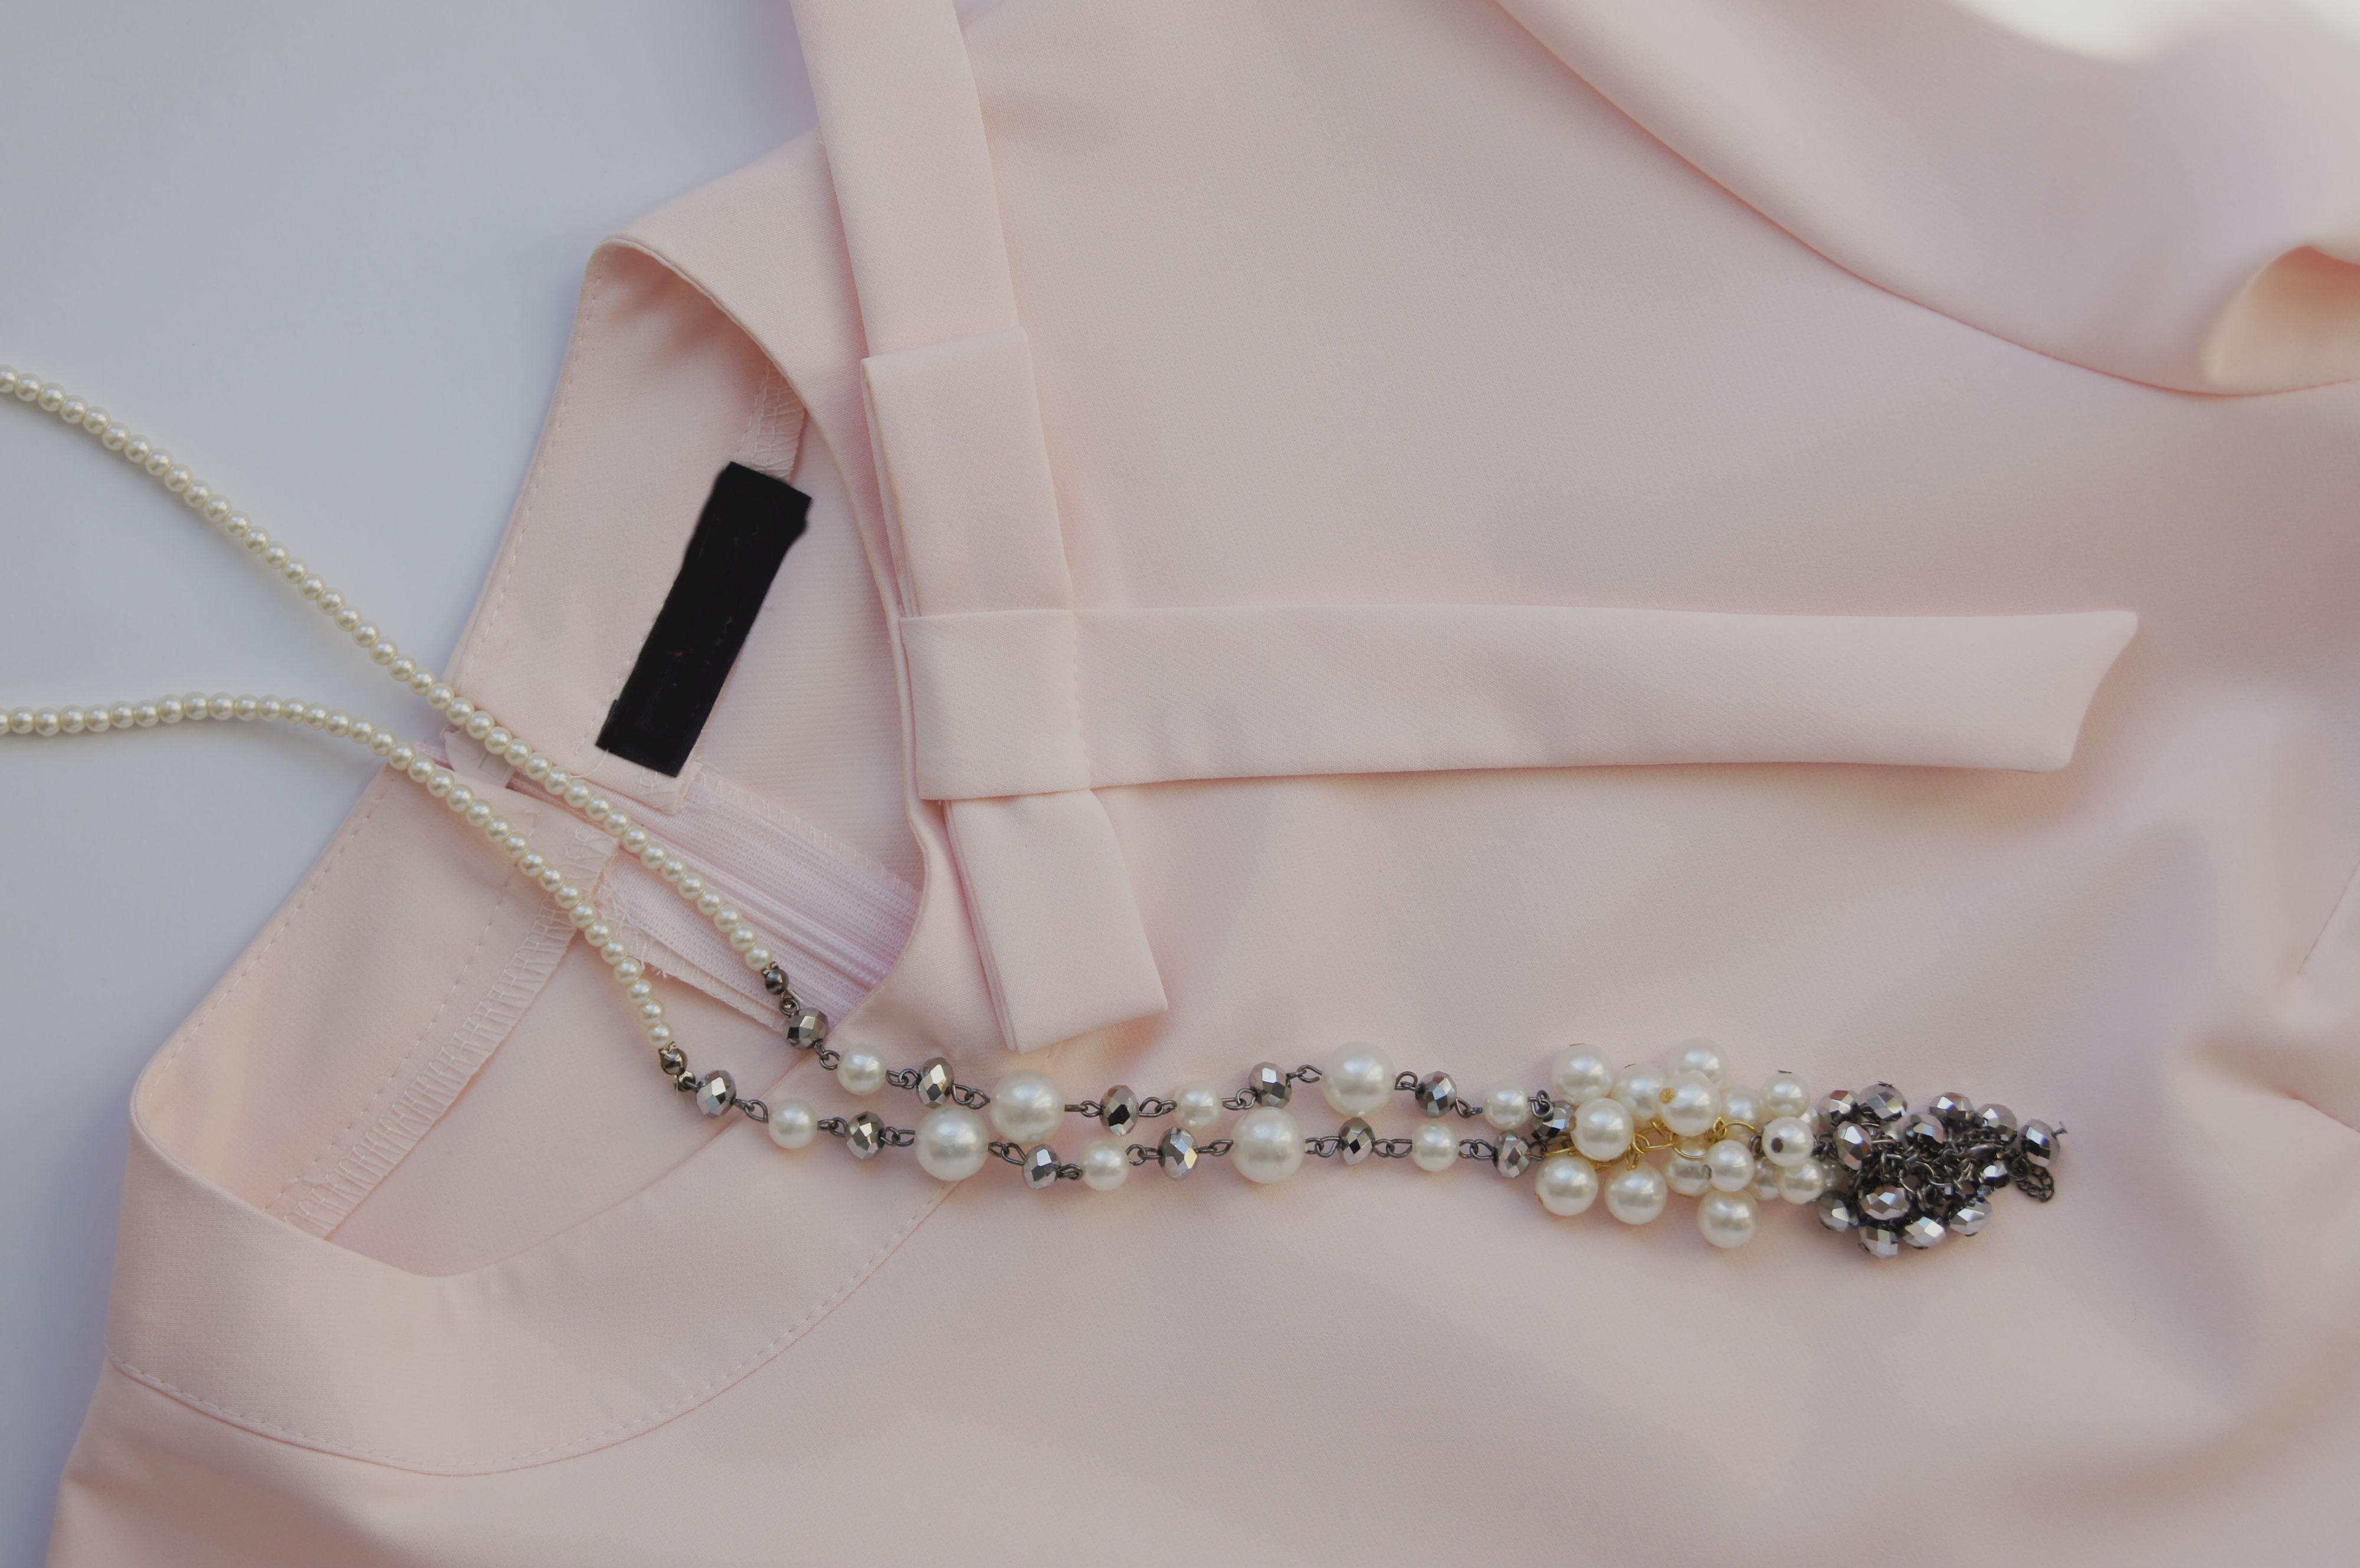 bluzka i biżuteria